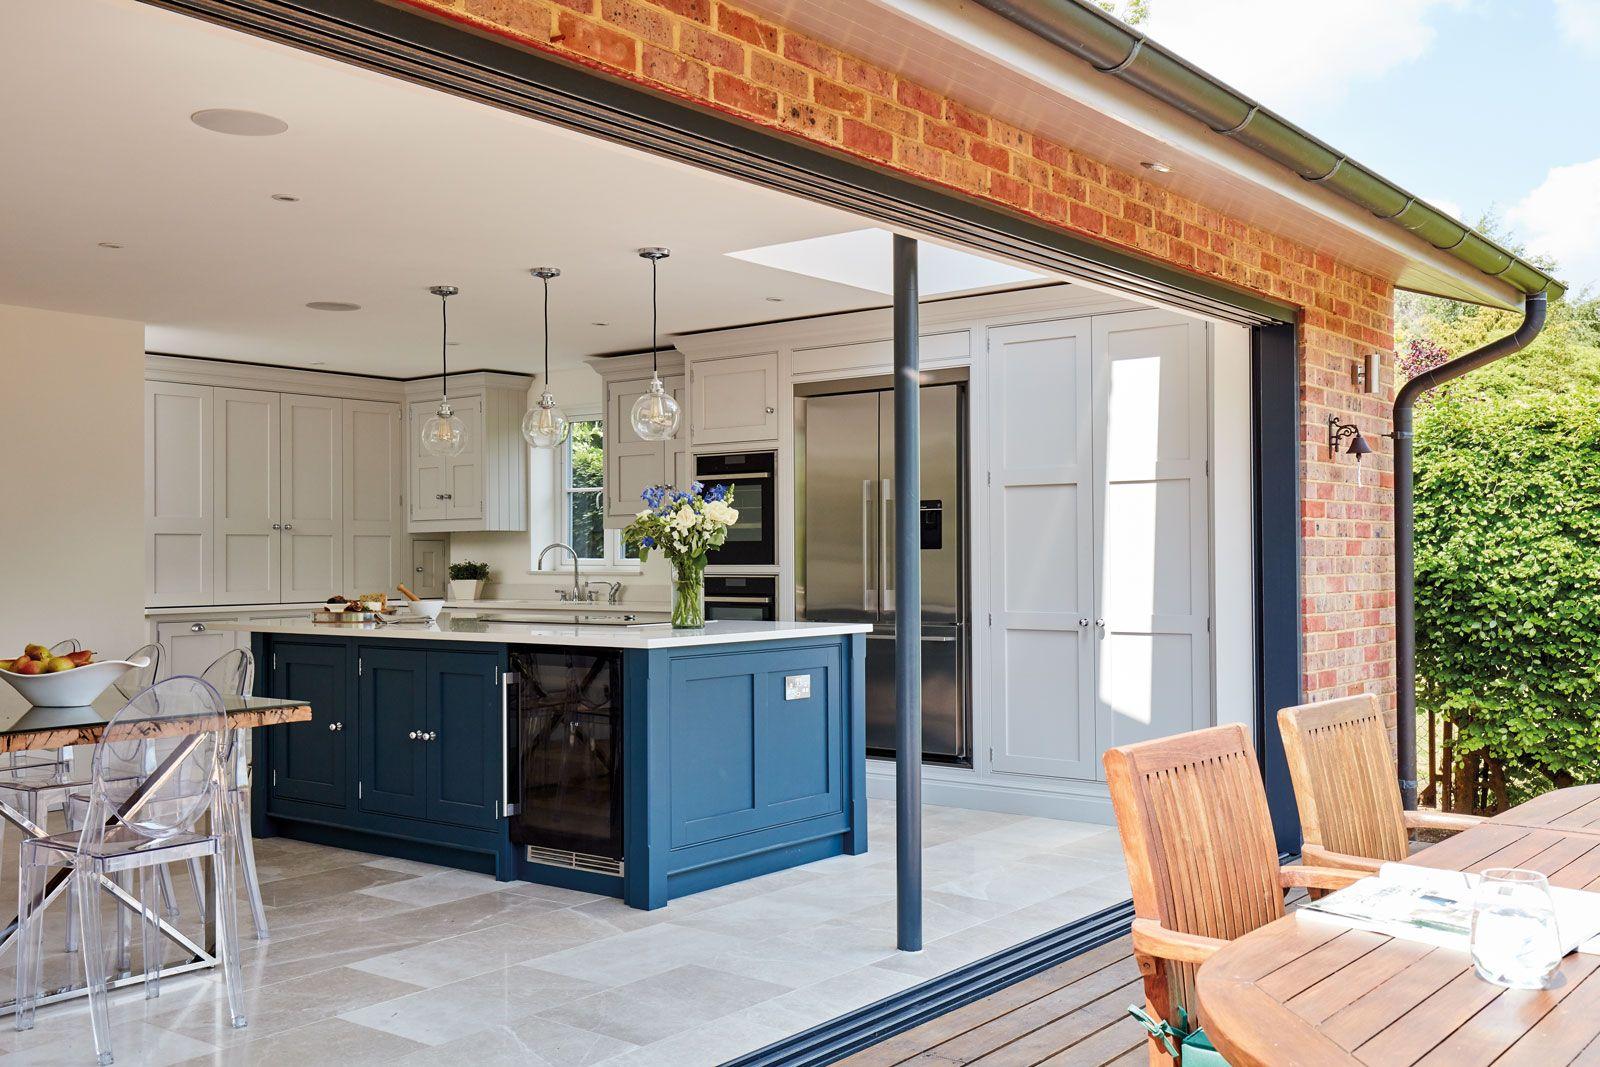 Blue Shaker Kitchen in 2019 | Blue shaker kitchen, Kitchen ...